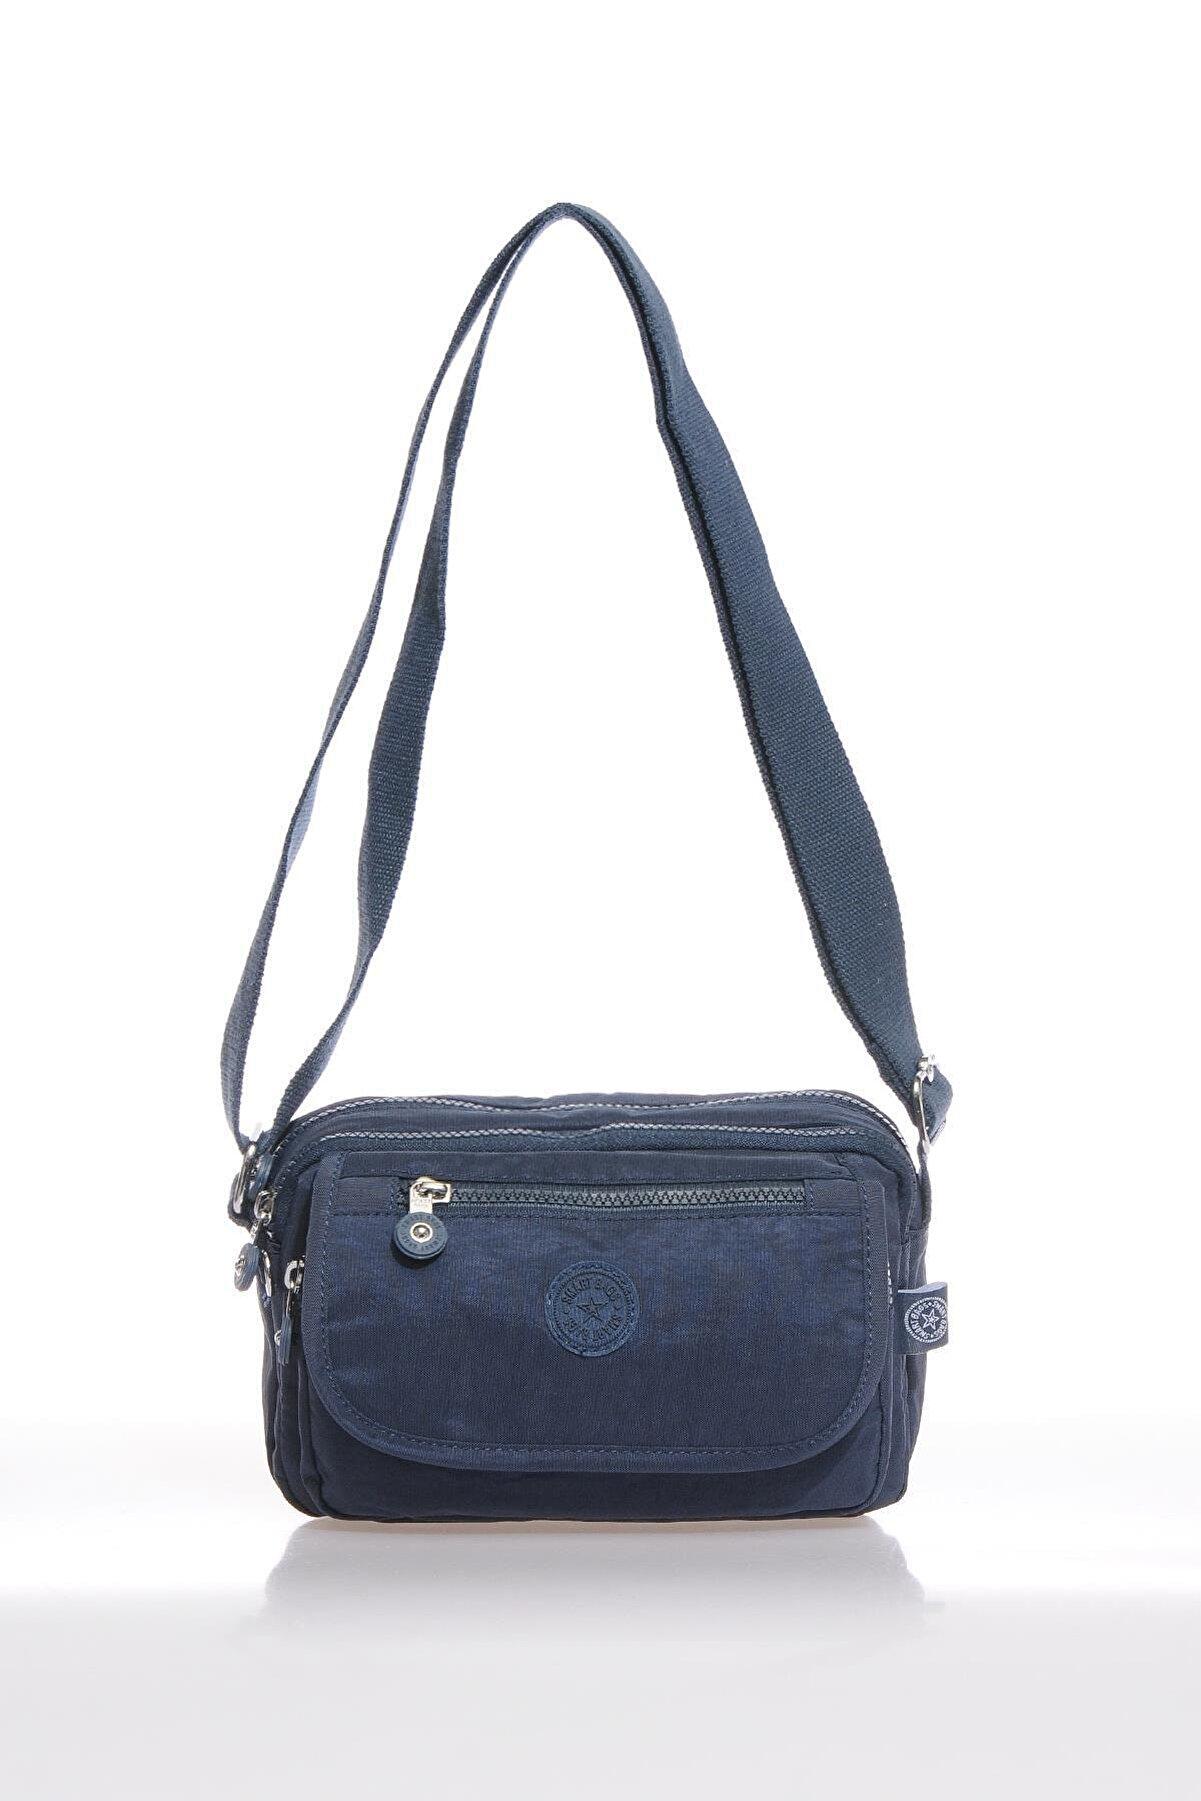 Smart Bags Kadın Lacivert Çapraz Çanta Smb1189-0033